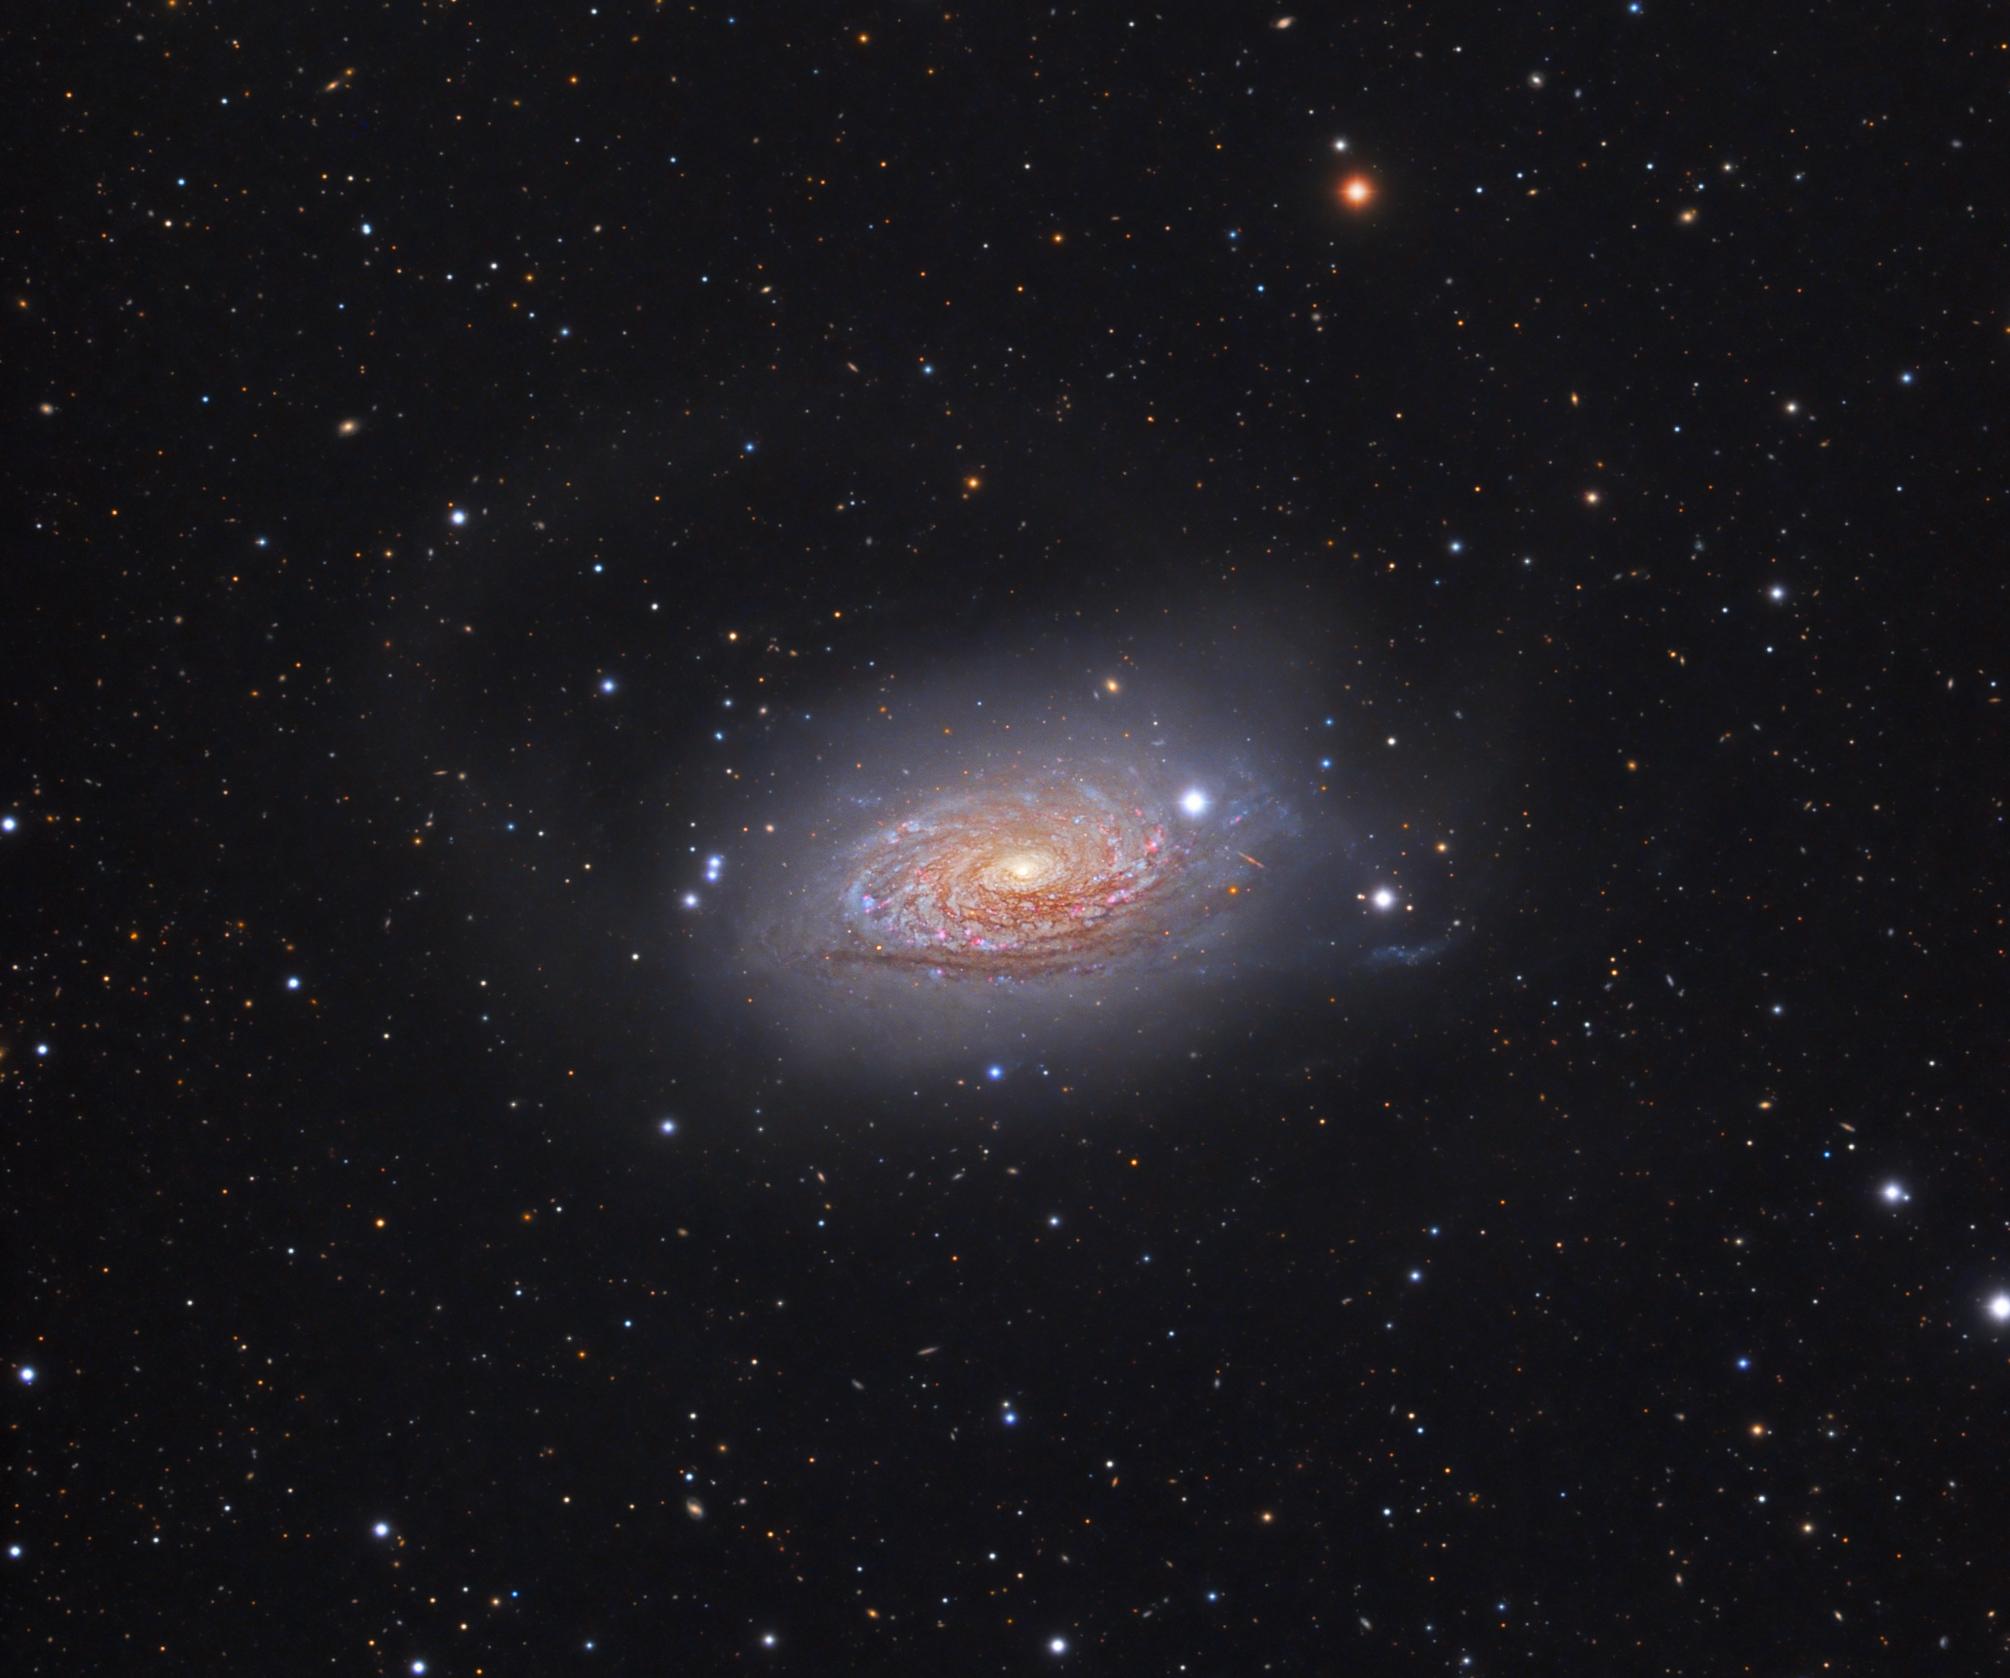 M63_koniec   Telescope: TEC140 f/5.2 Camera: QHY695A Mount: Paramount MyT Exposure: Exposure: 31h (Ha,L,R,G,B) L 115x600s, R 24x300s , G 24x300s, B 24x300s, Ha 17x1200s (binx1) Date and place: 05.2019, Observatory E-EyE, Fregenal de la Sierra, Spain